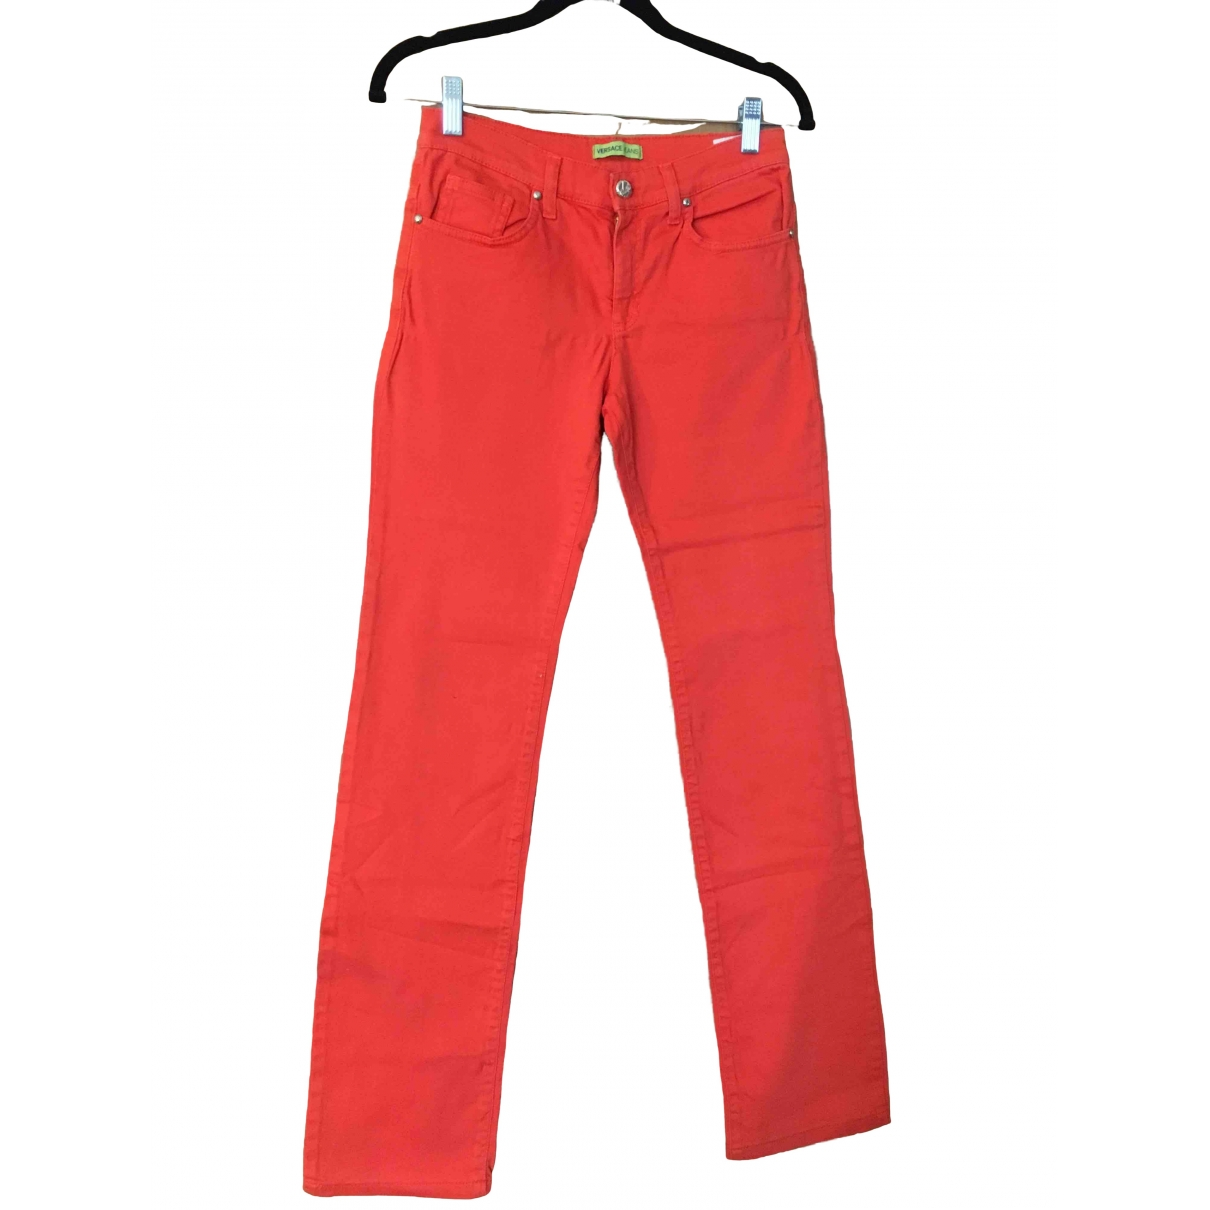 Versace Jeans \N Orange Cotton Jeans for Women 36 FR